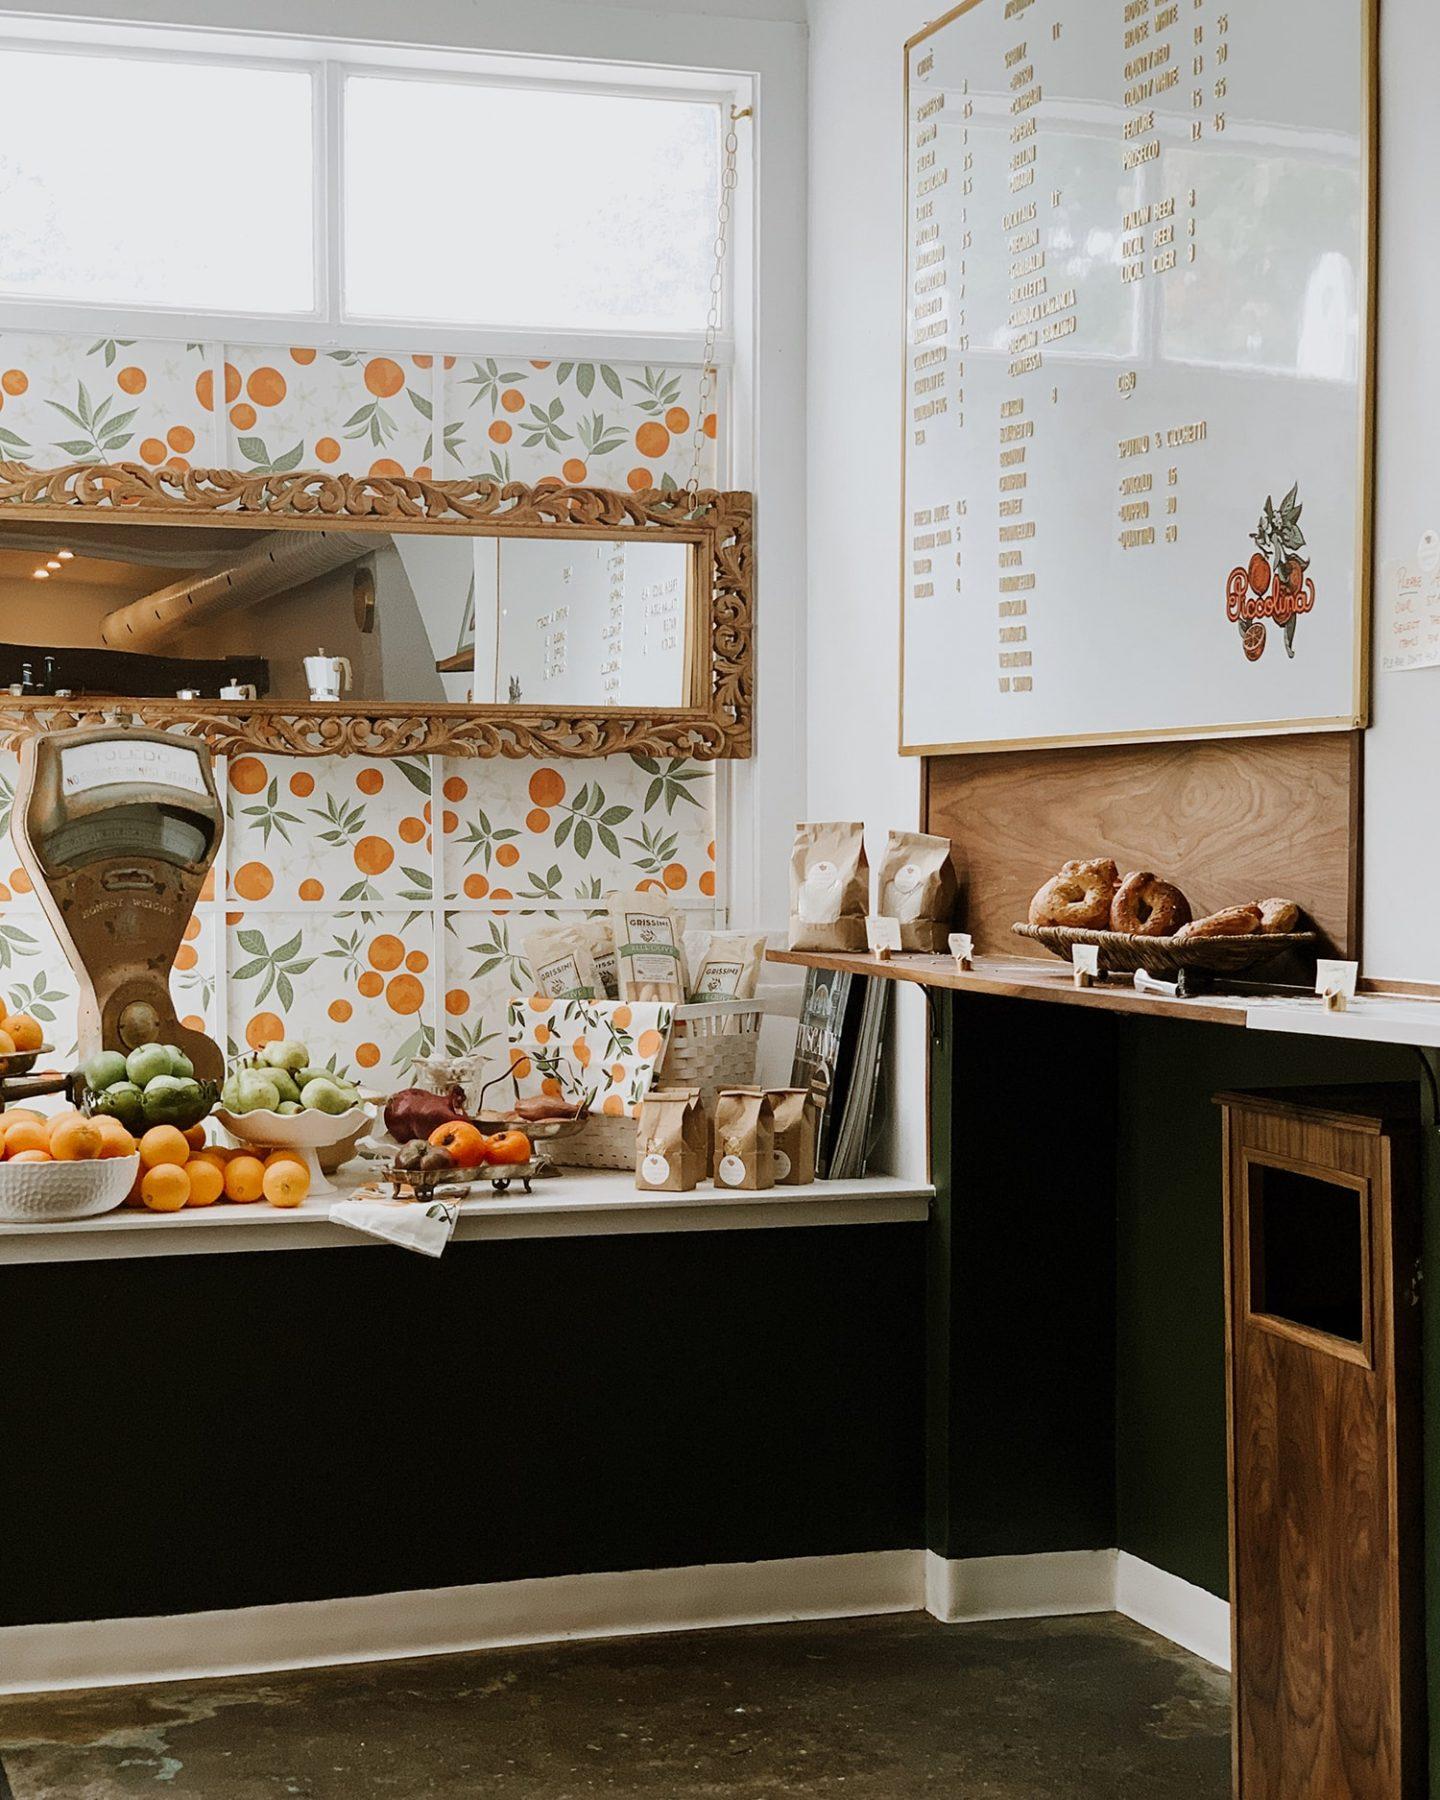 Enid Grace Culinary in Wellington, Prince Edward County